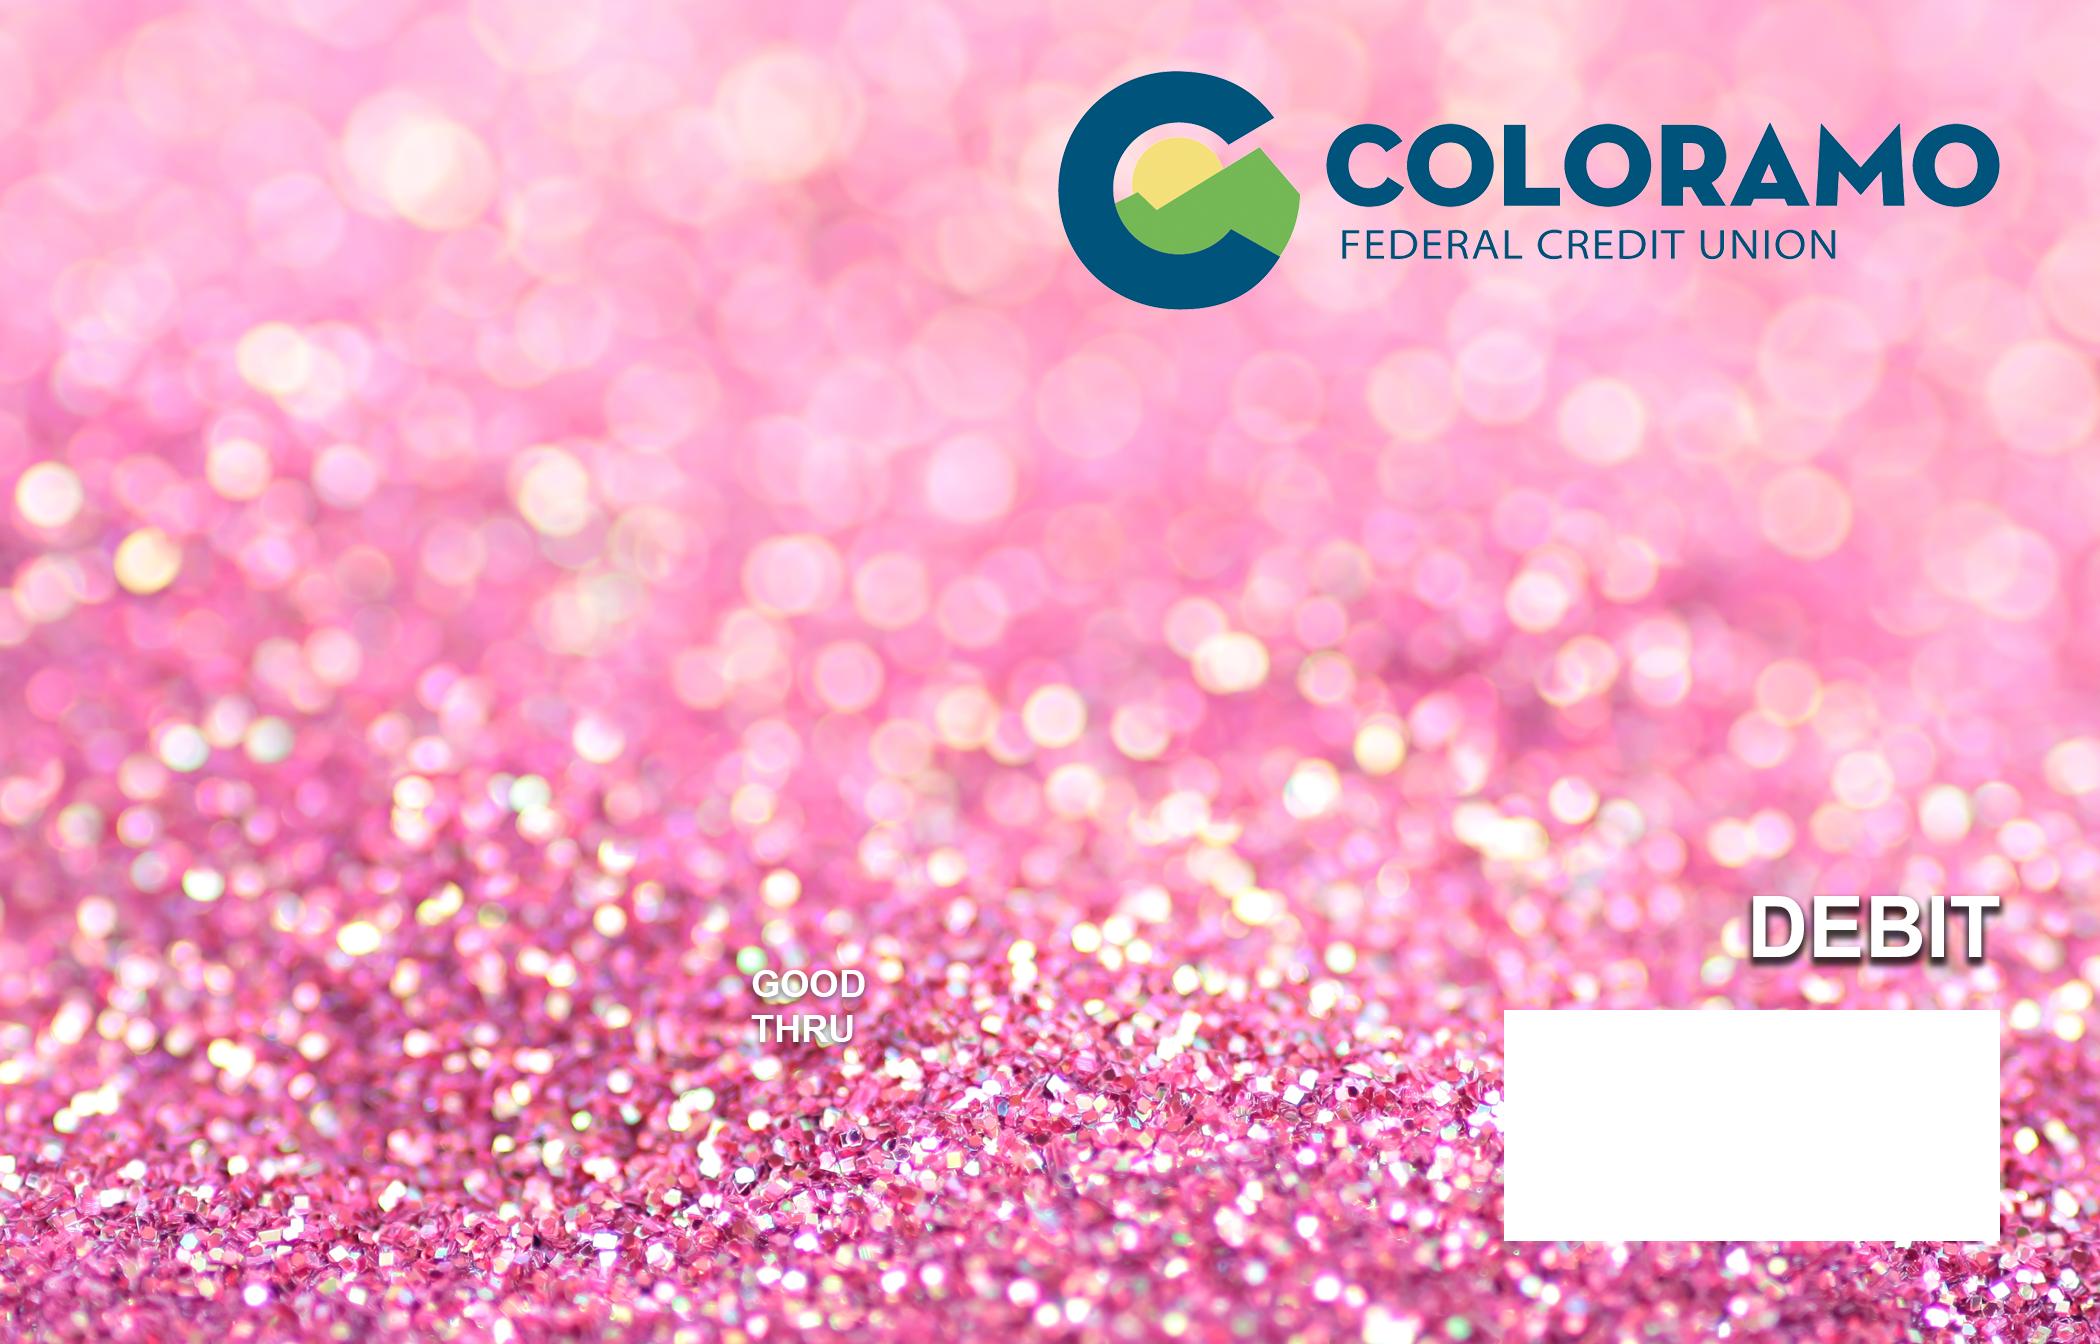 Pink Sparkles Debit Card.png